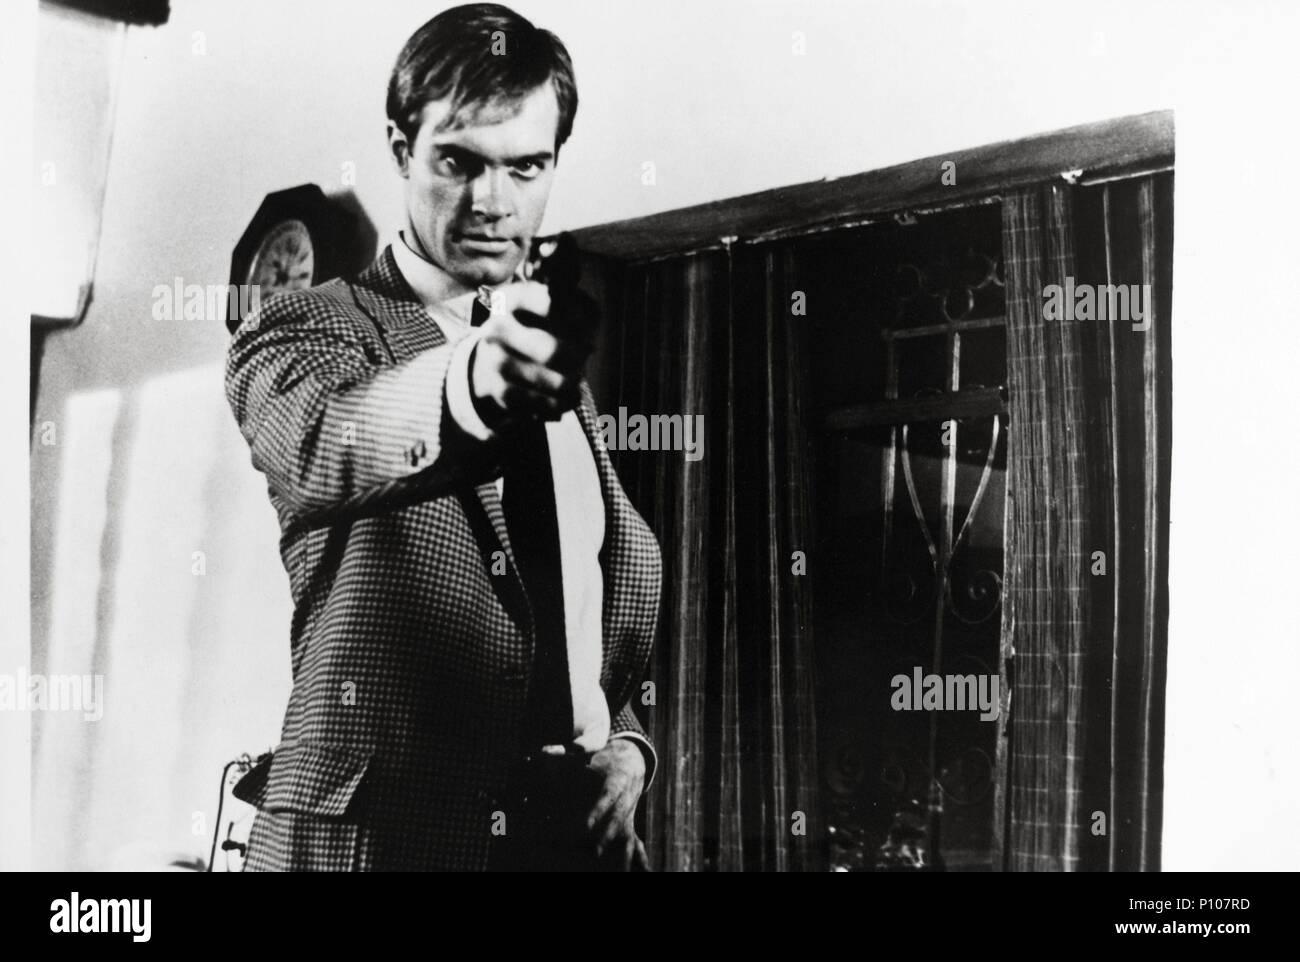 Original Film Title: THE RHINEMANN EXCHANGE.  English Title: THE RHINEMANN EXCHANGE.  Film Director: BURT KENNEDY.  Year: 1977.  Stars: STEPHEN COLLINS. - Stock Image